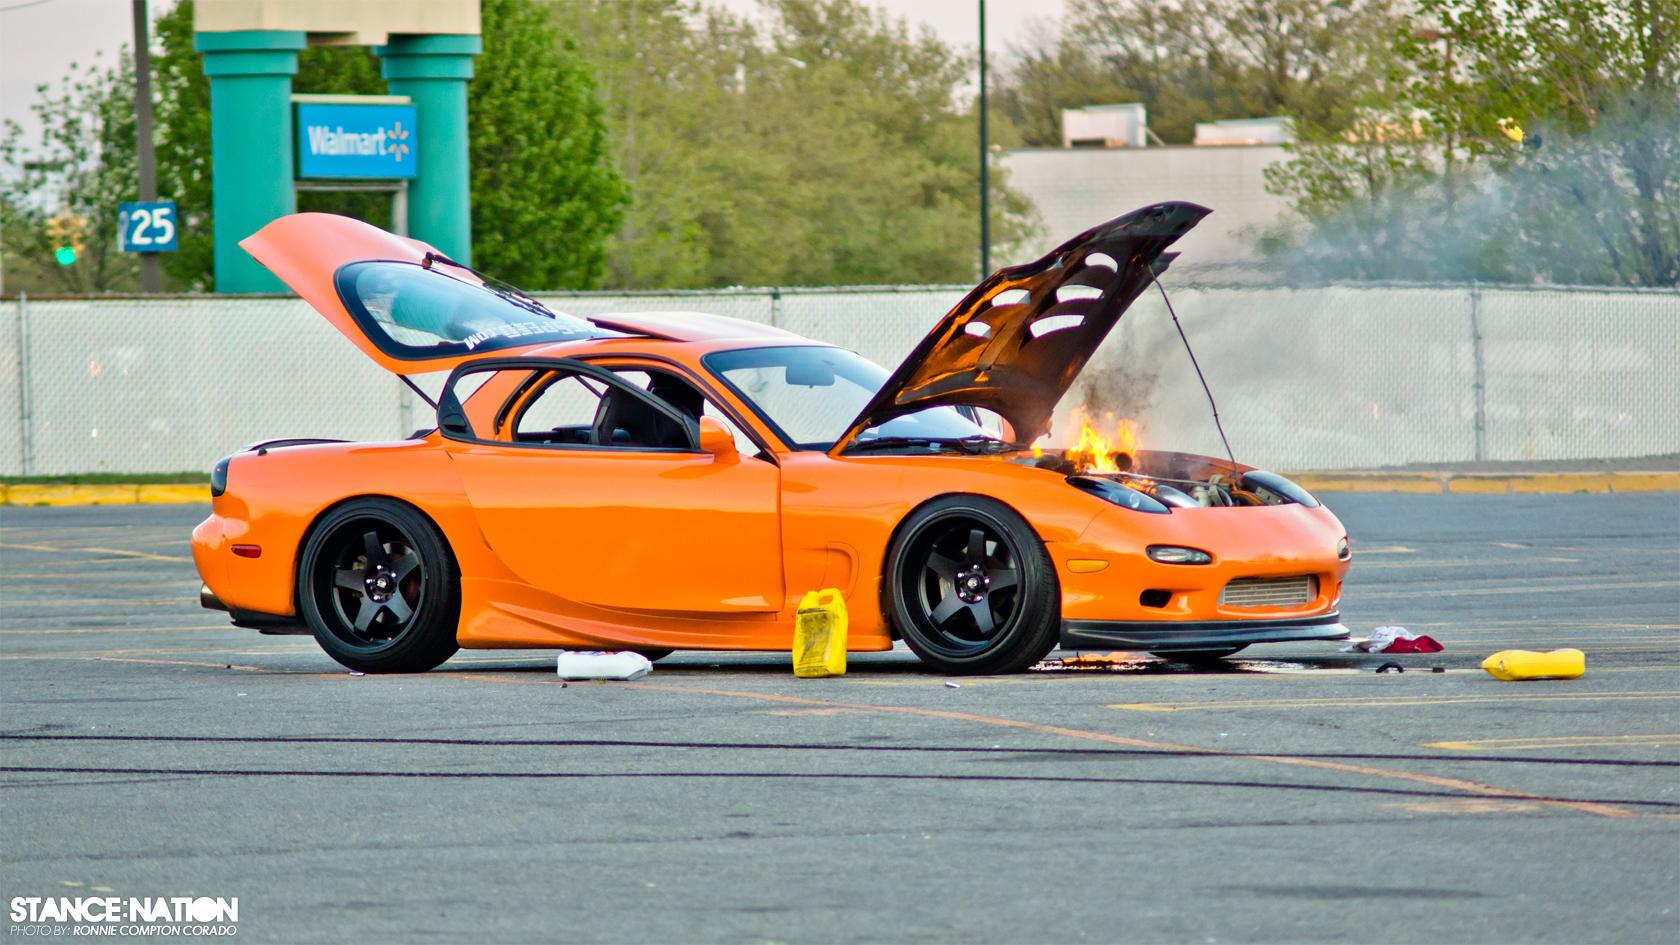 Slammed U0026 Stanced Flush Fitment Mazda RX7 ...